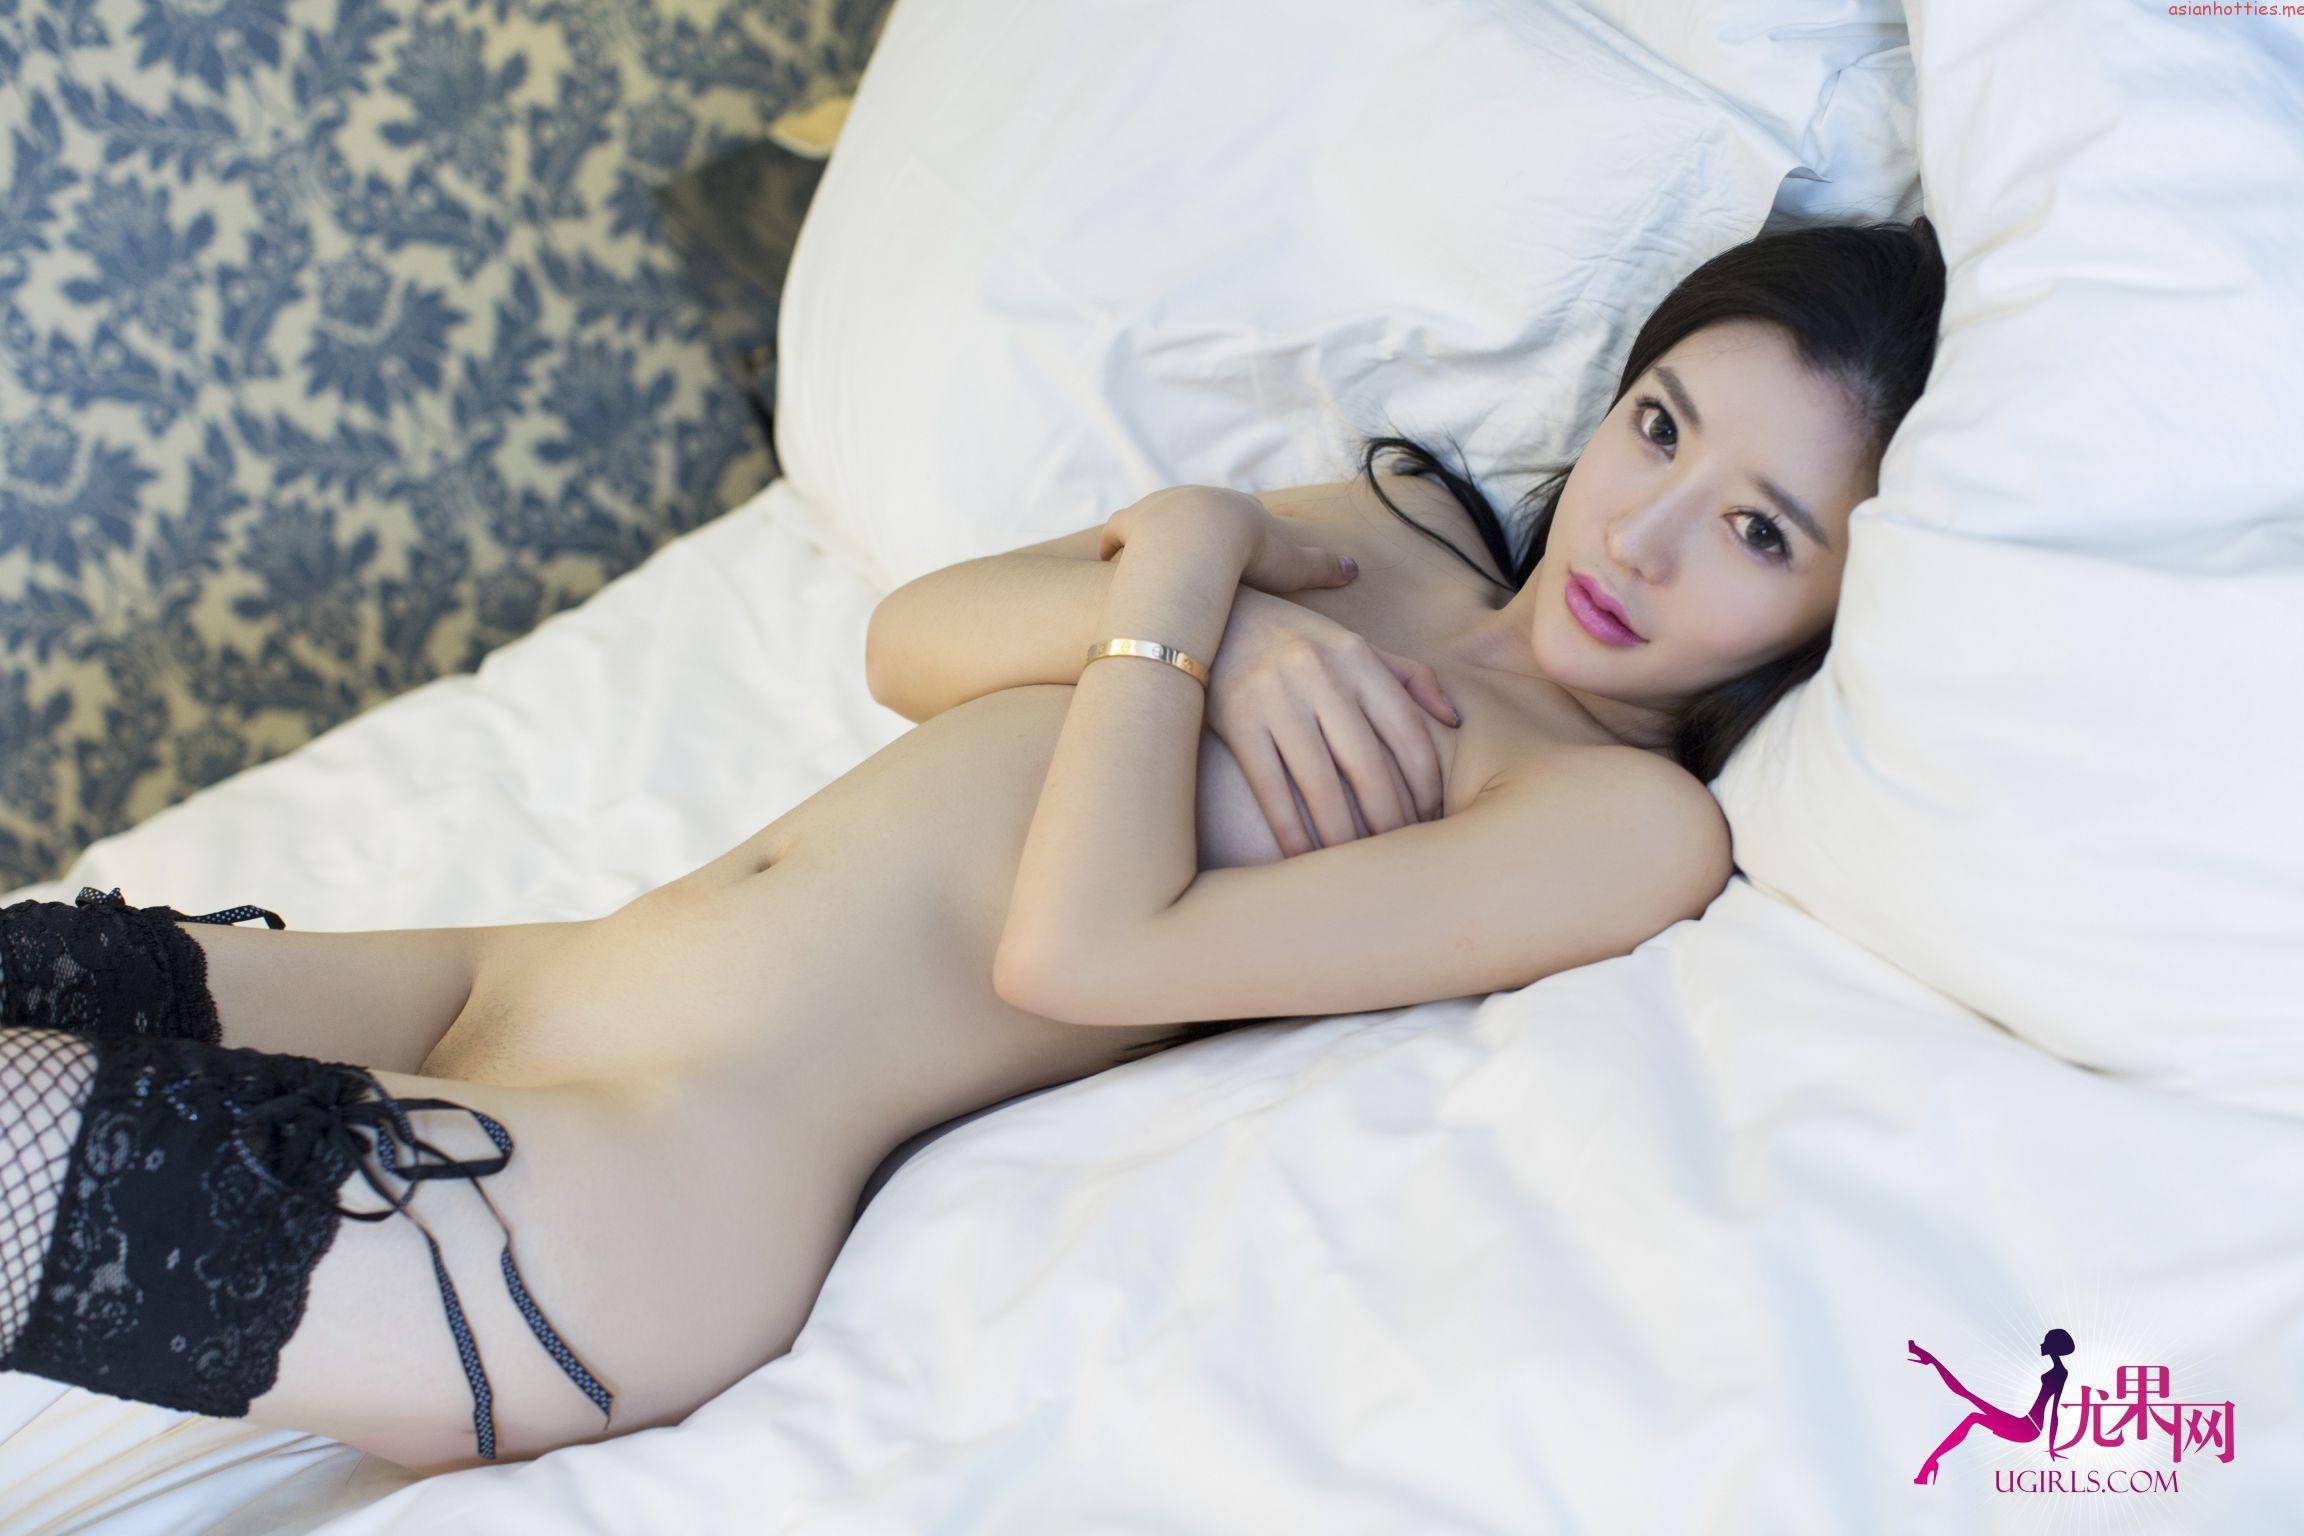 Chinese girl galery